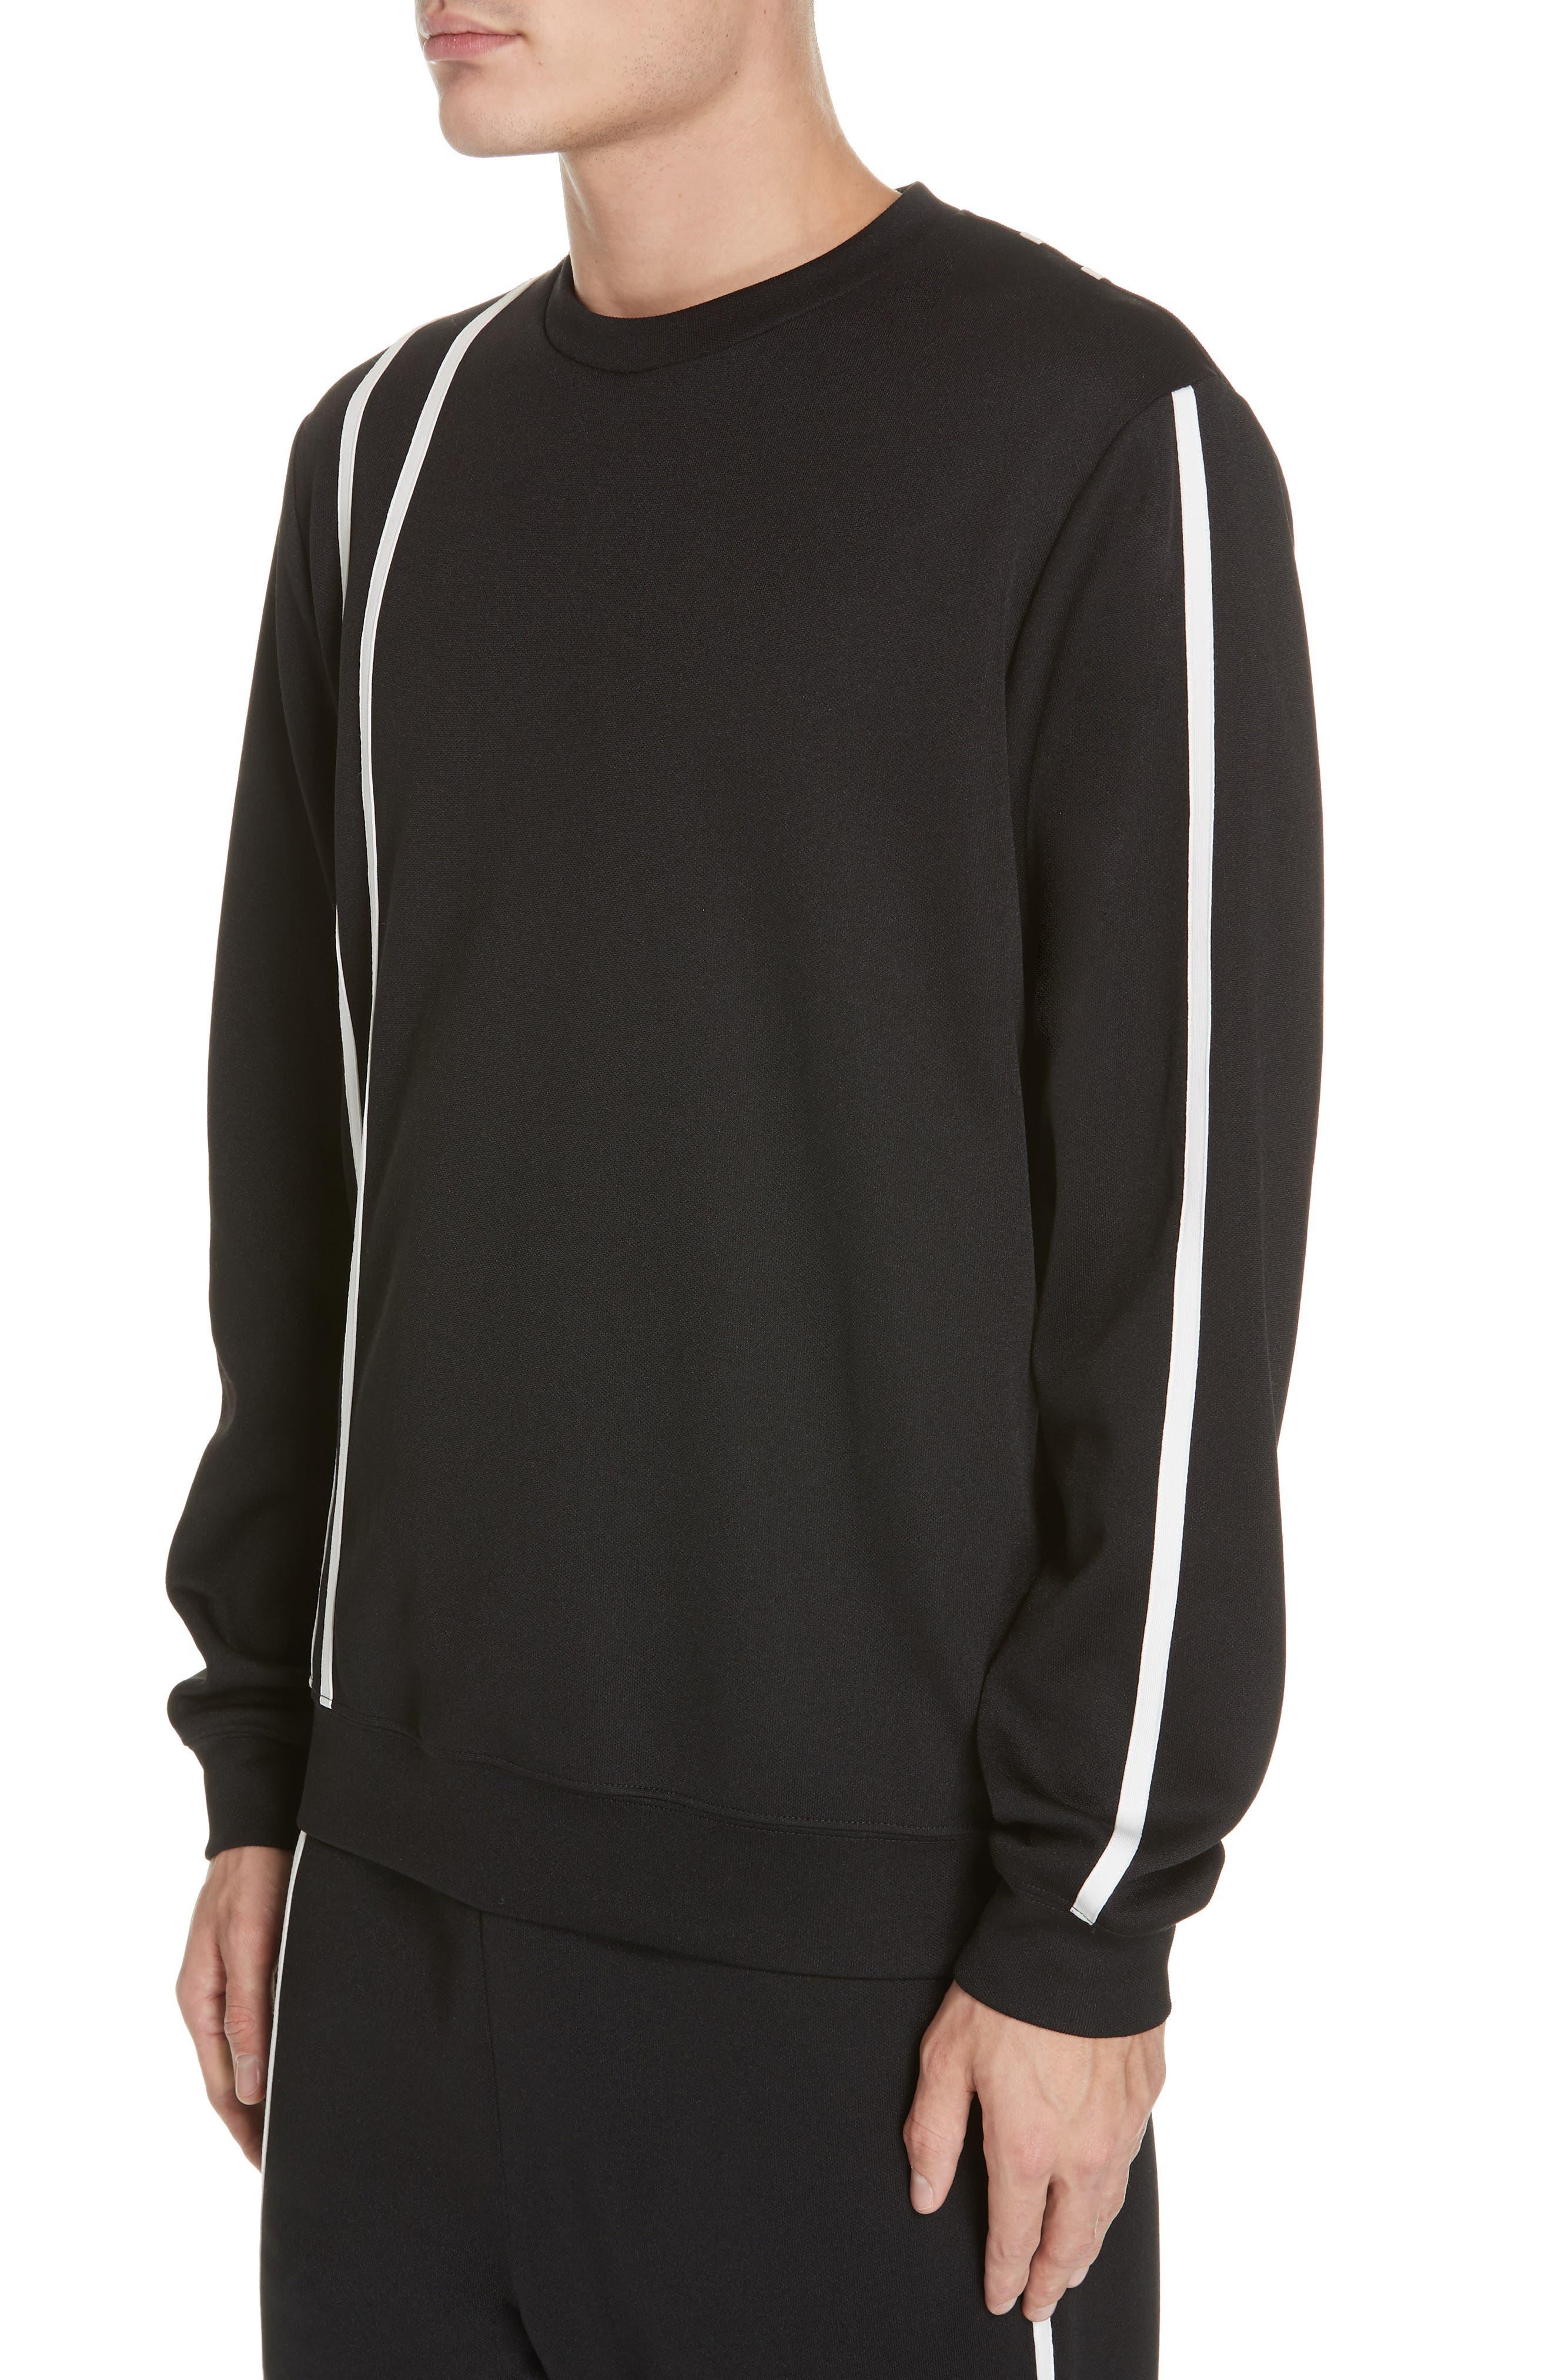 HELMUT LANG, Sport Stripe Print Sweatshirt, Alternate thumbnail 4, color, BLACK AND WHITE